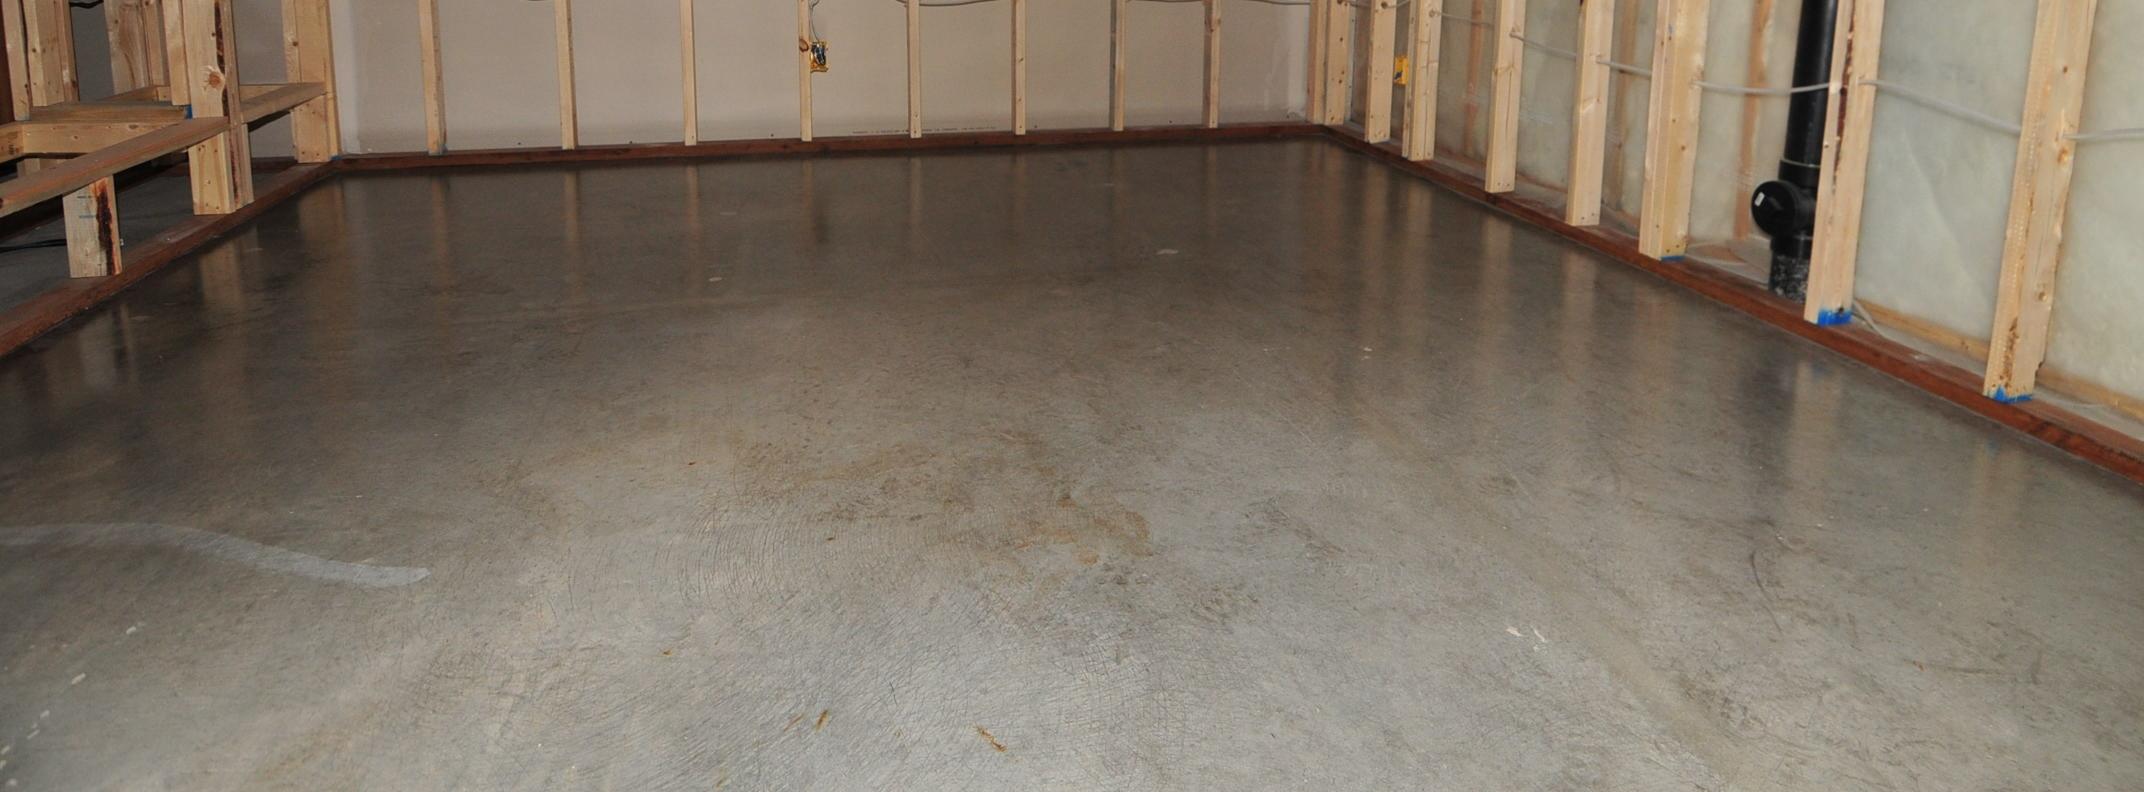 Sealing Basement Floors Concrete